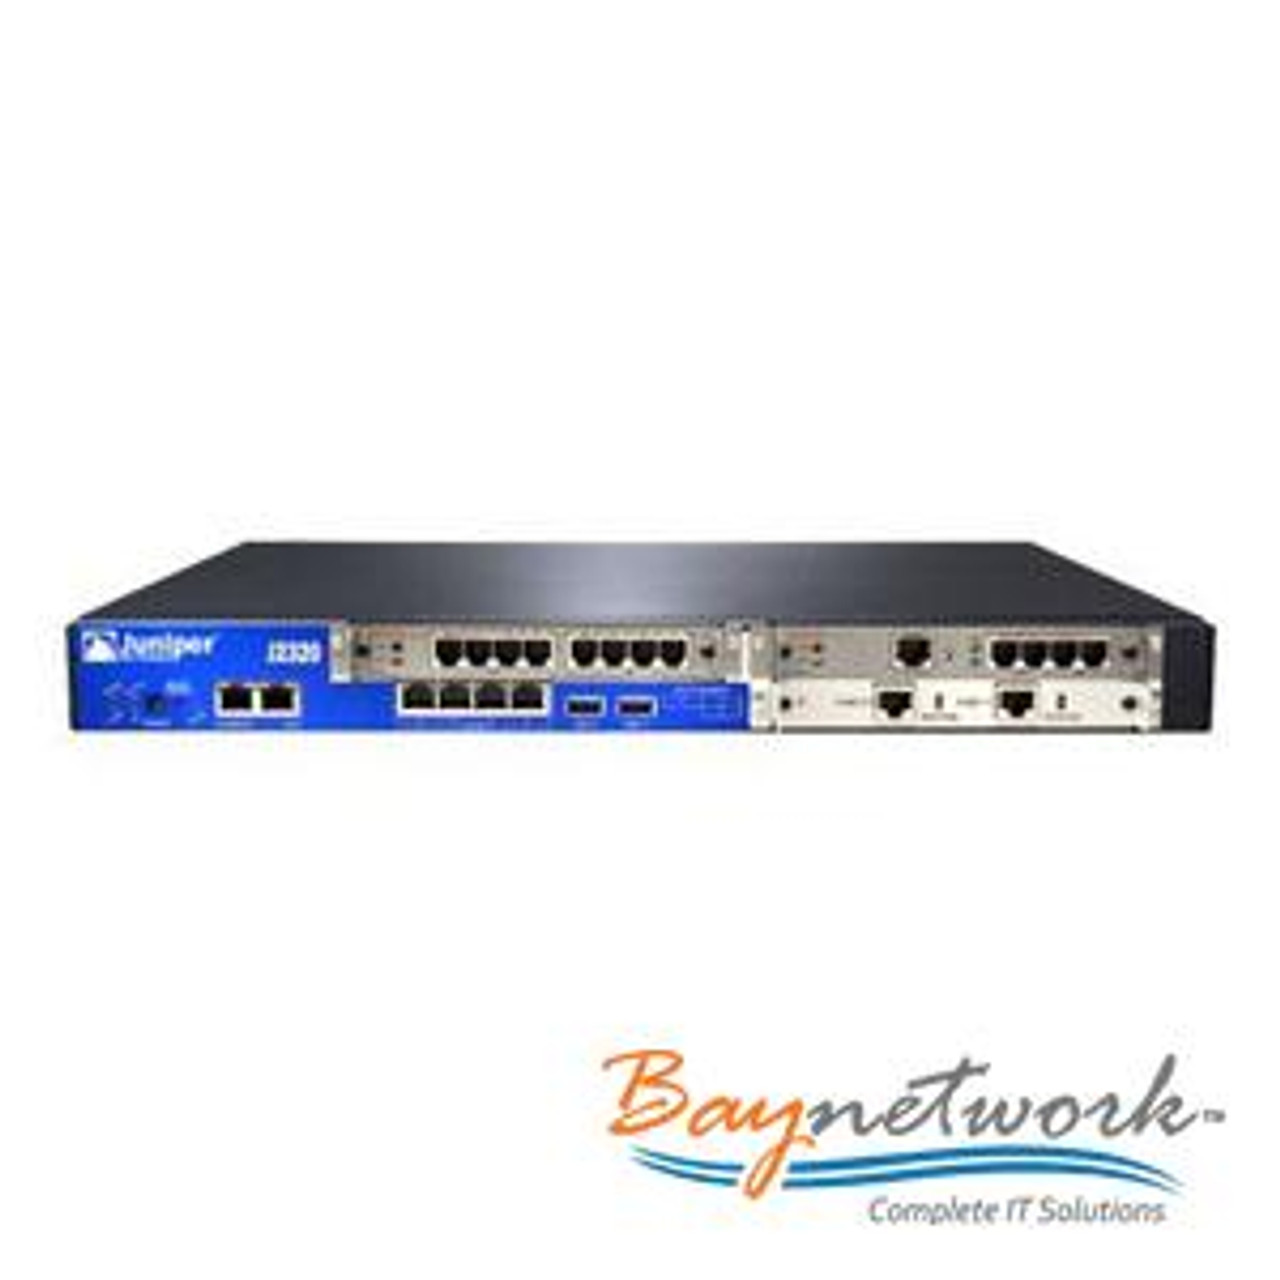 Juniper J2320-JH-1G-CF-SC J-Series Service Router 3 PIM Slots JDP